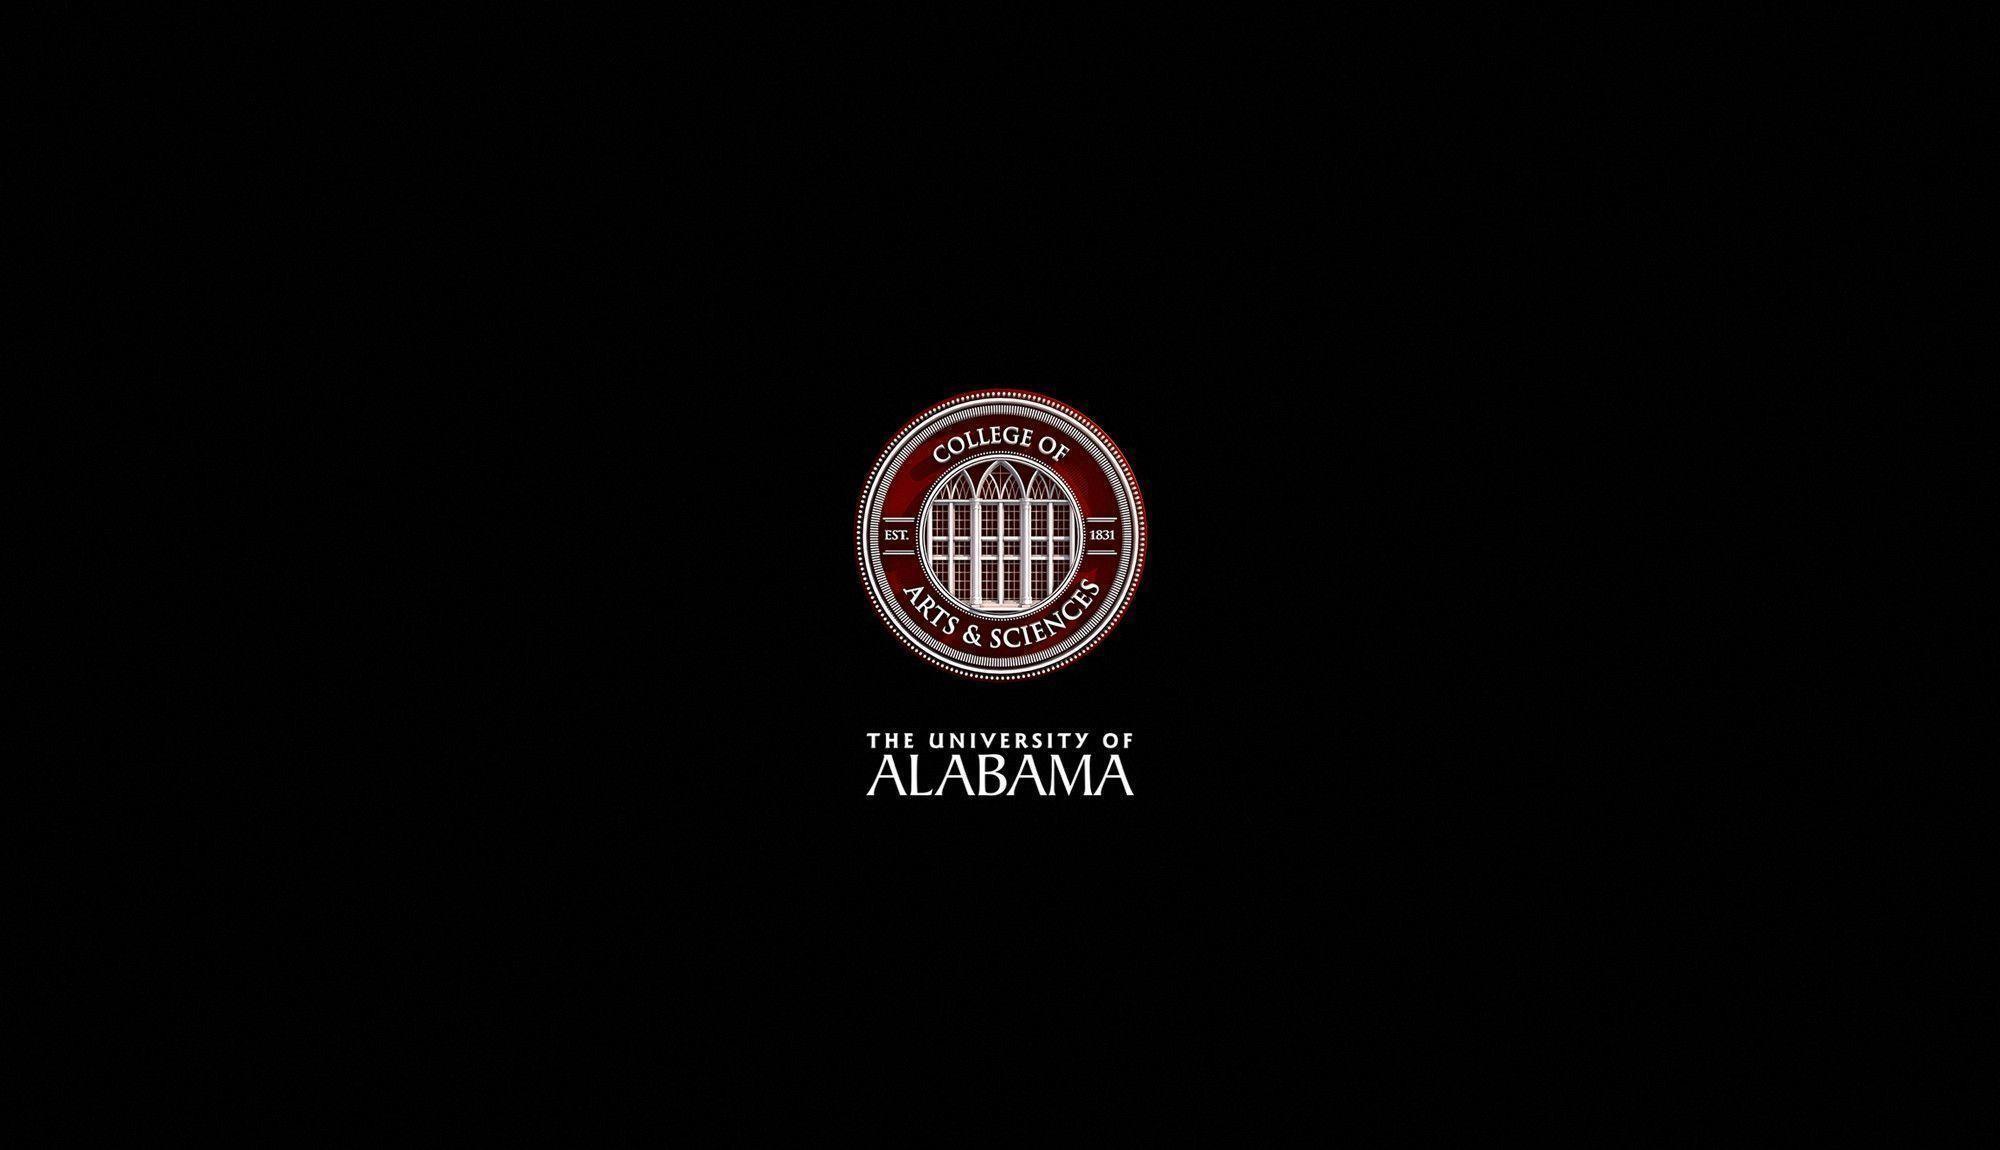 University Of Alabama Wallpapers Wallpapertag